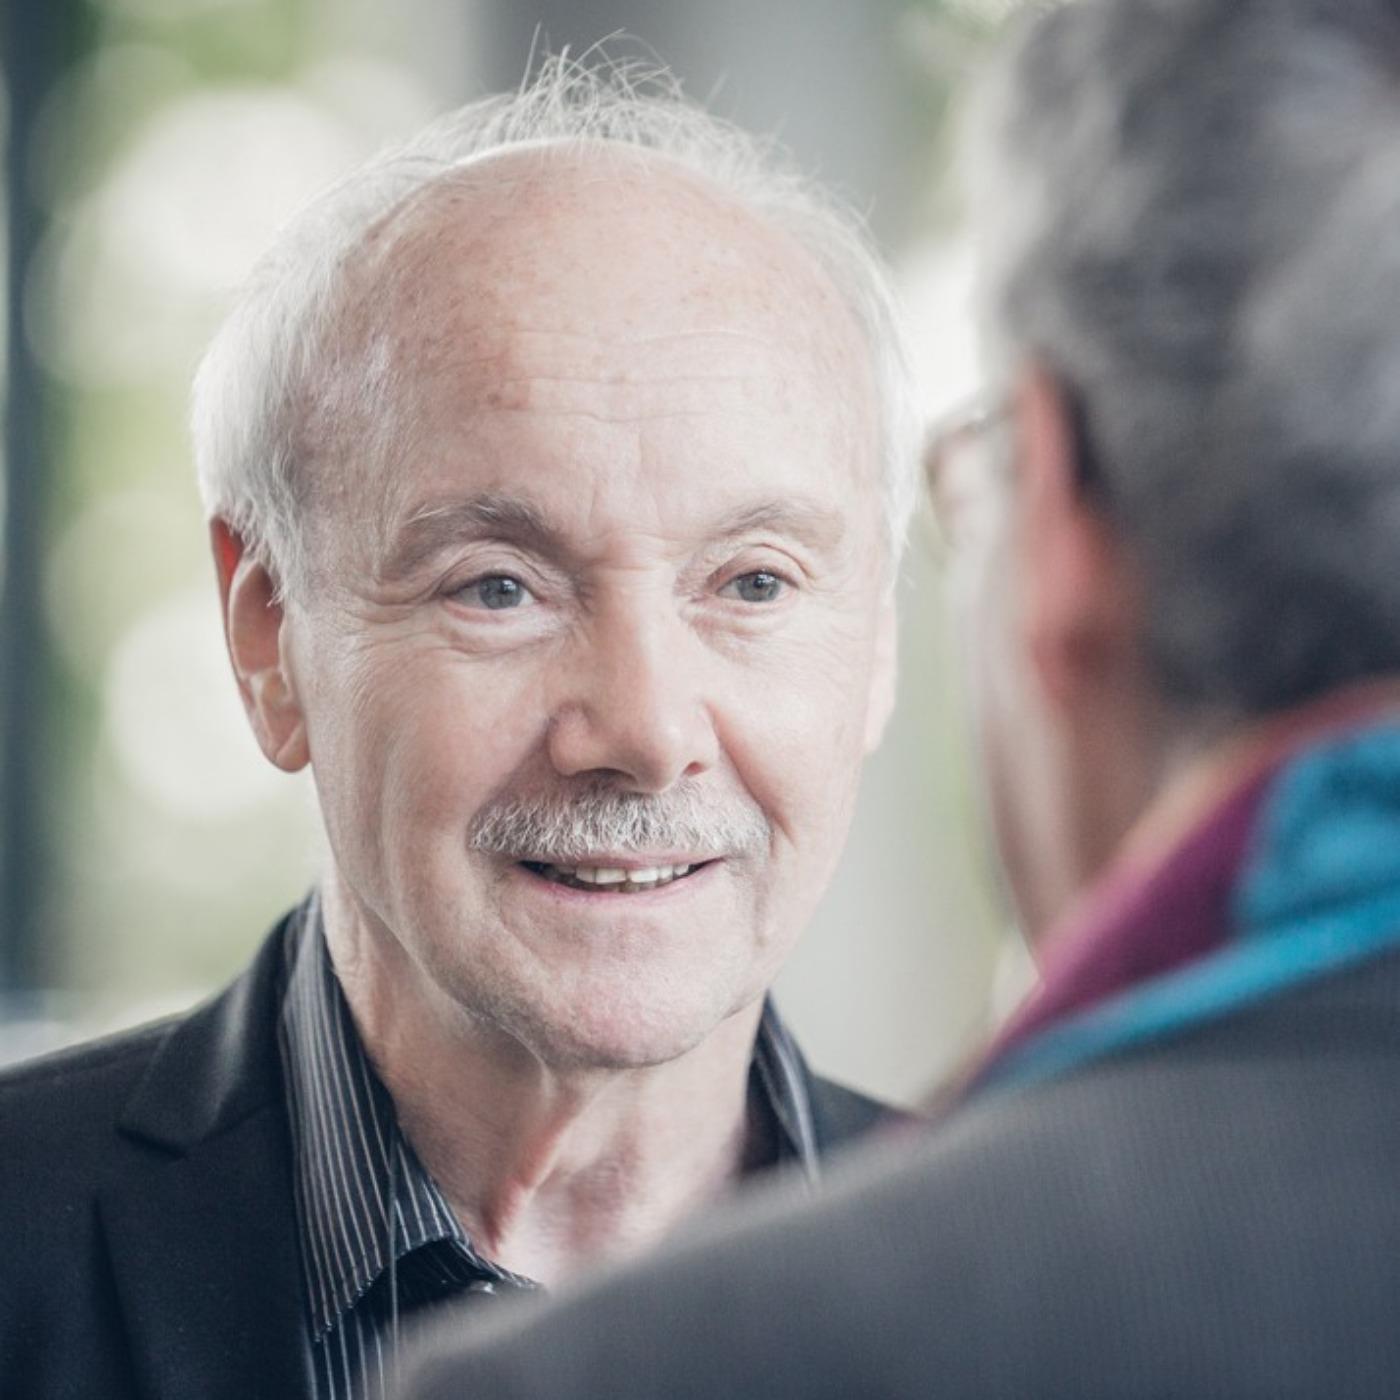 Labor für Entrepreneurship - Prof. Günter Faltin & Thomas Bachem